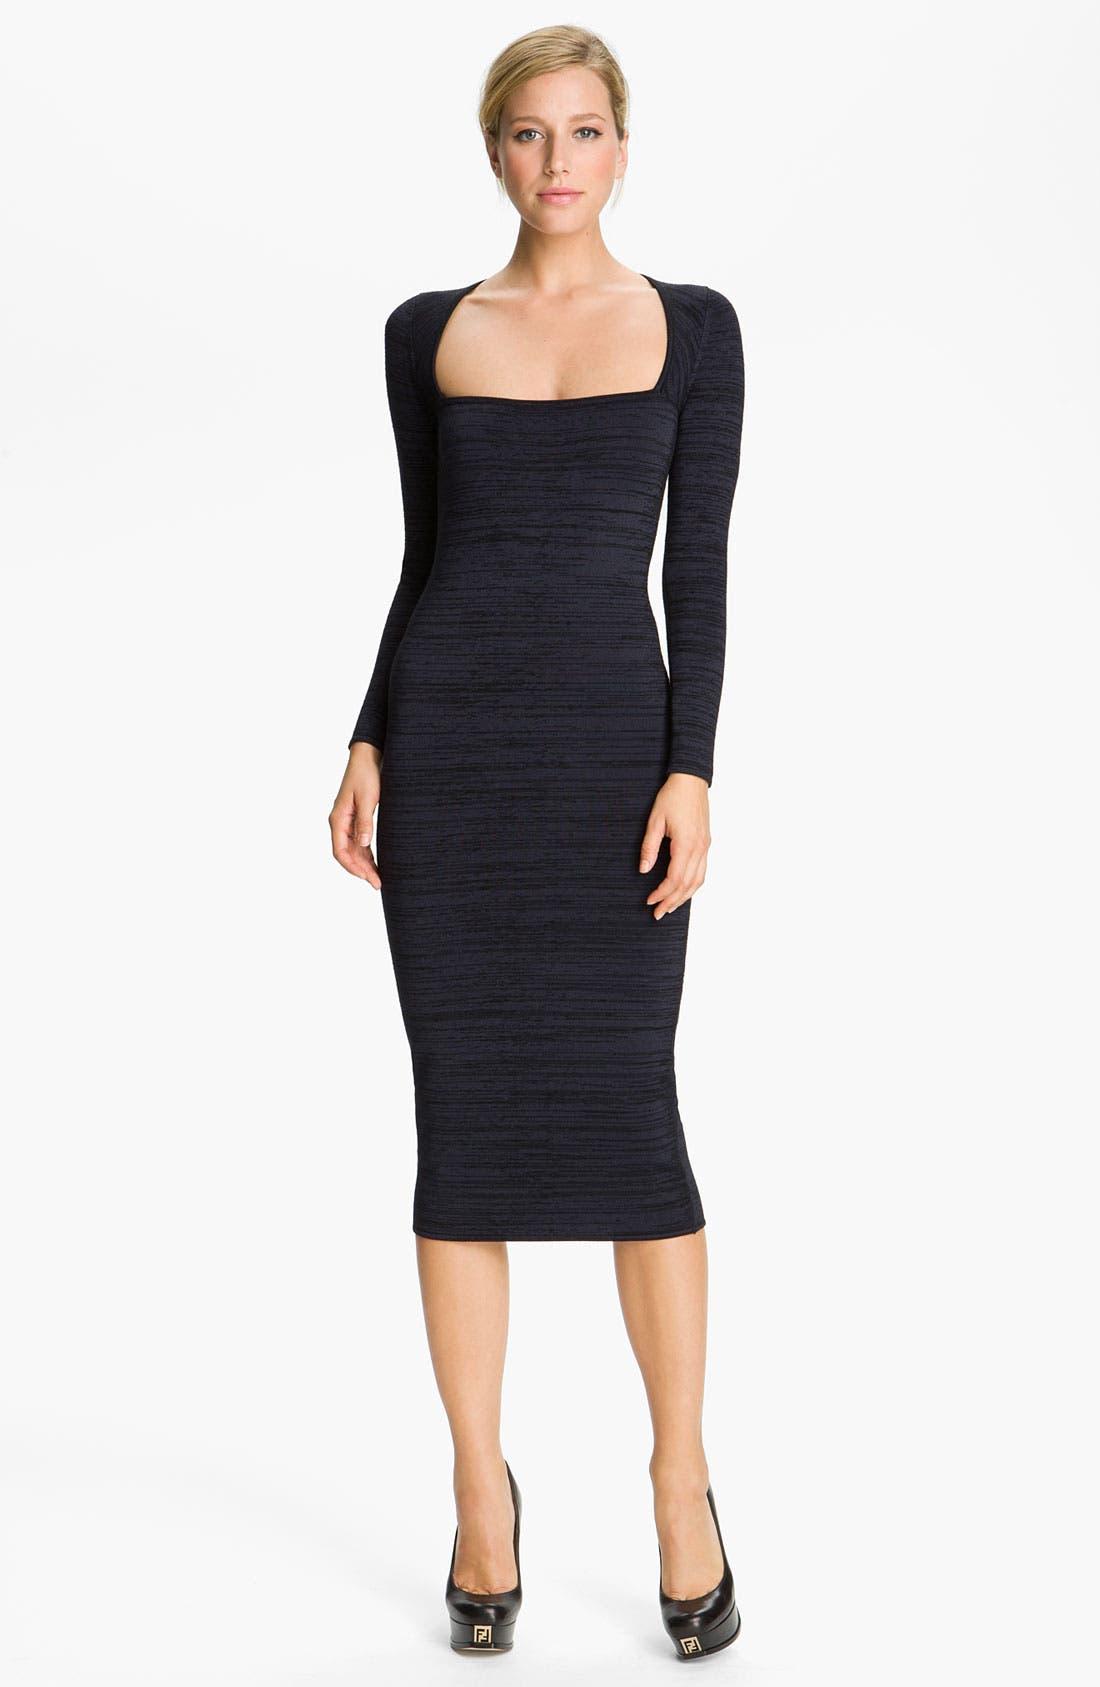 Main Image - A.L.C. 'Ree' Square Neck Dress